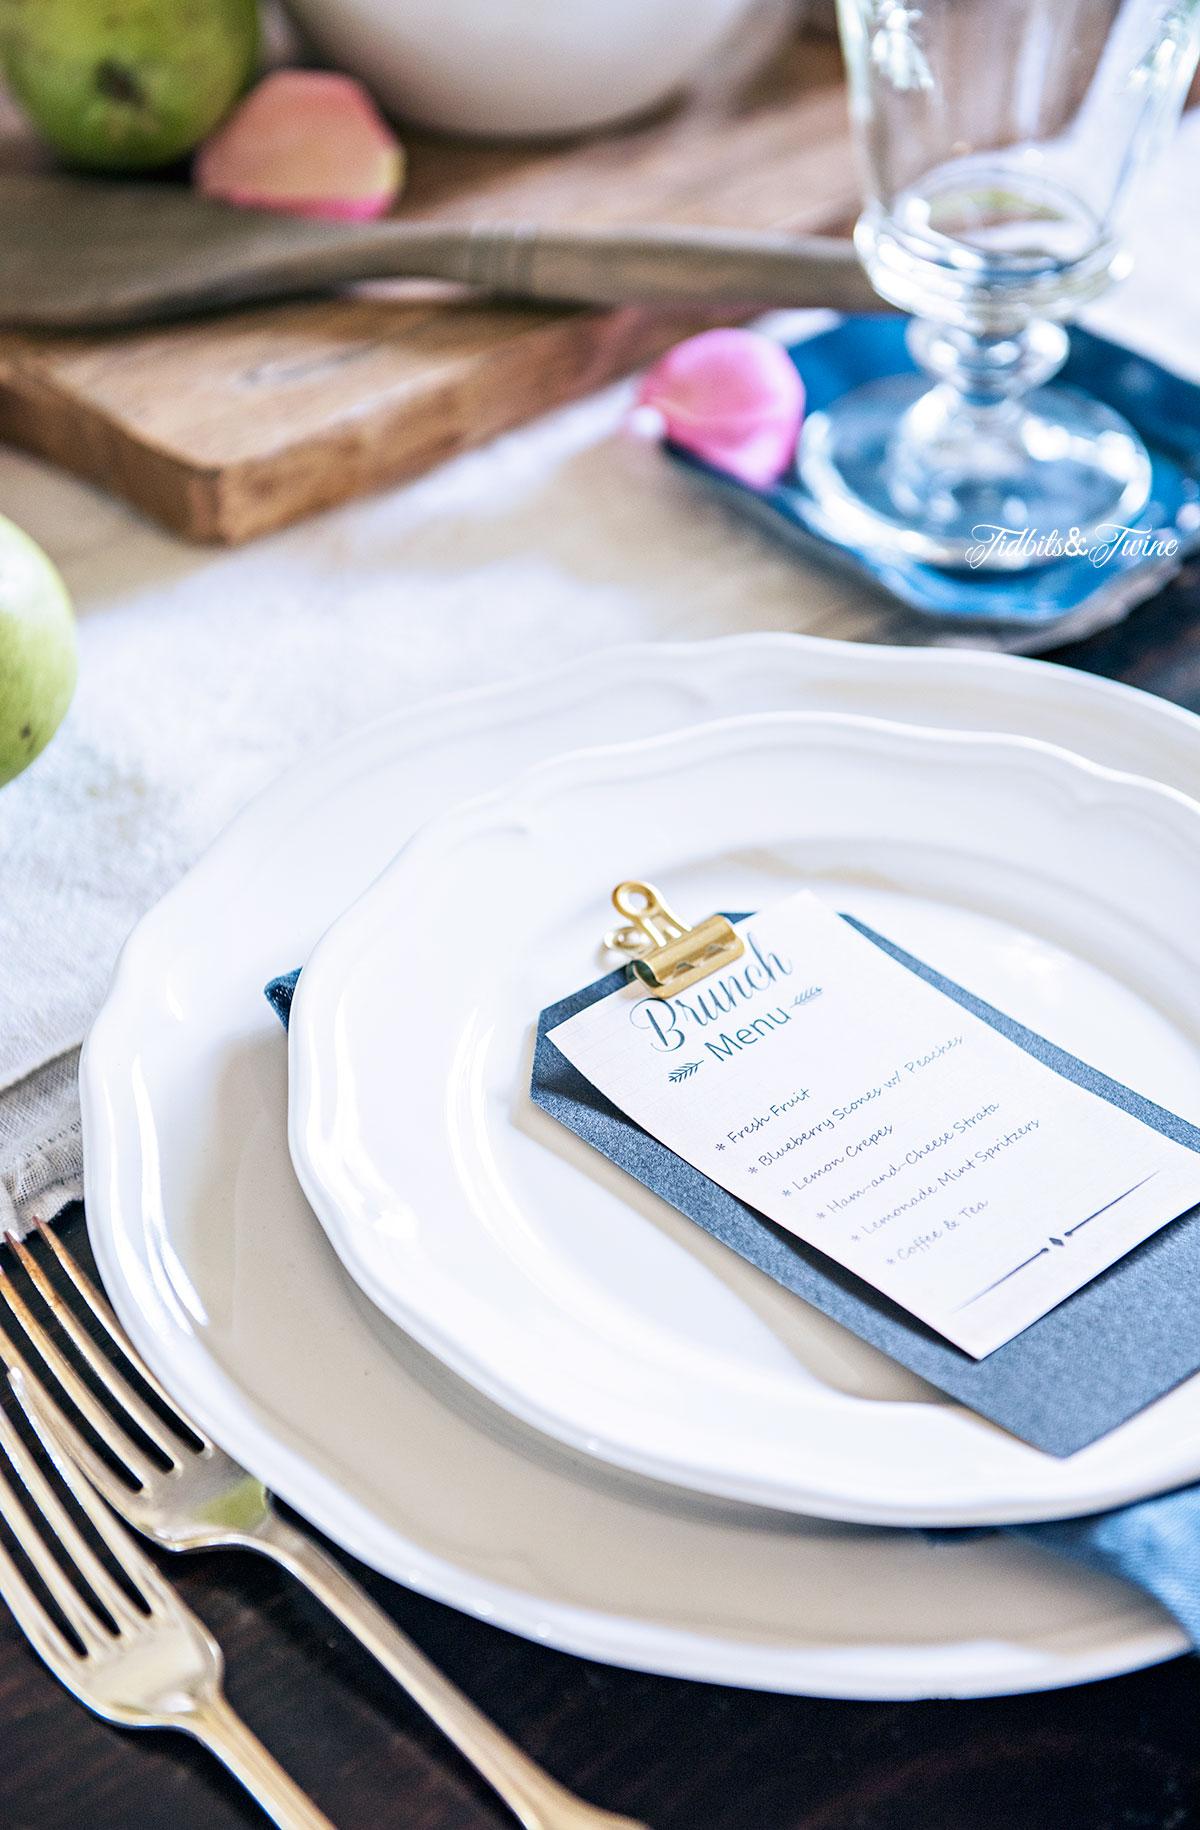 TIDBITS&TWINE Dining Room 2016 DIY Mini Menu Brunch Place Setting